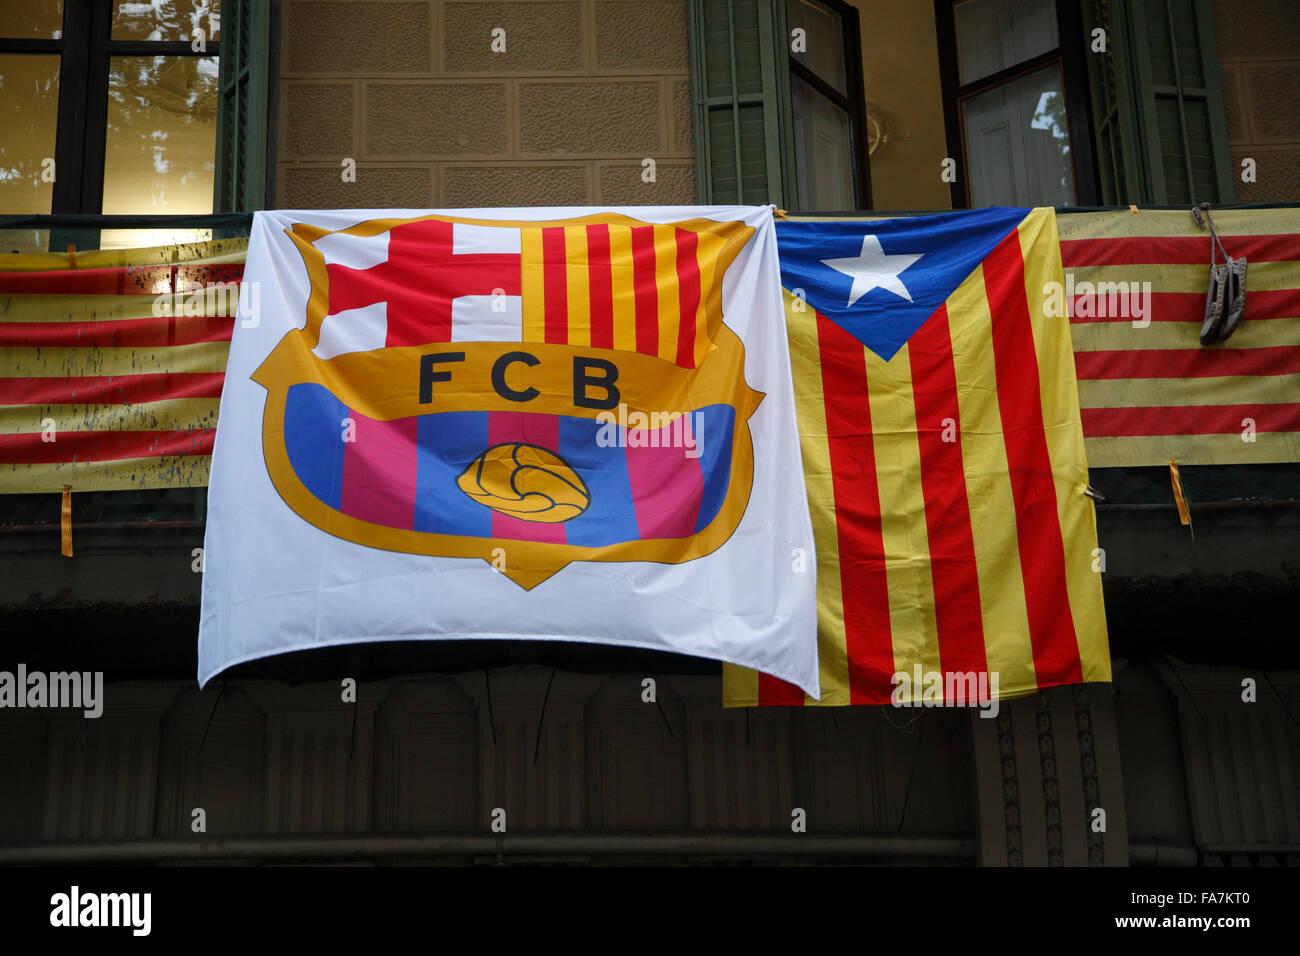 Flags of FC Barcelona and Catalunya, Barcelona, Spain, Europe - Stock Image